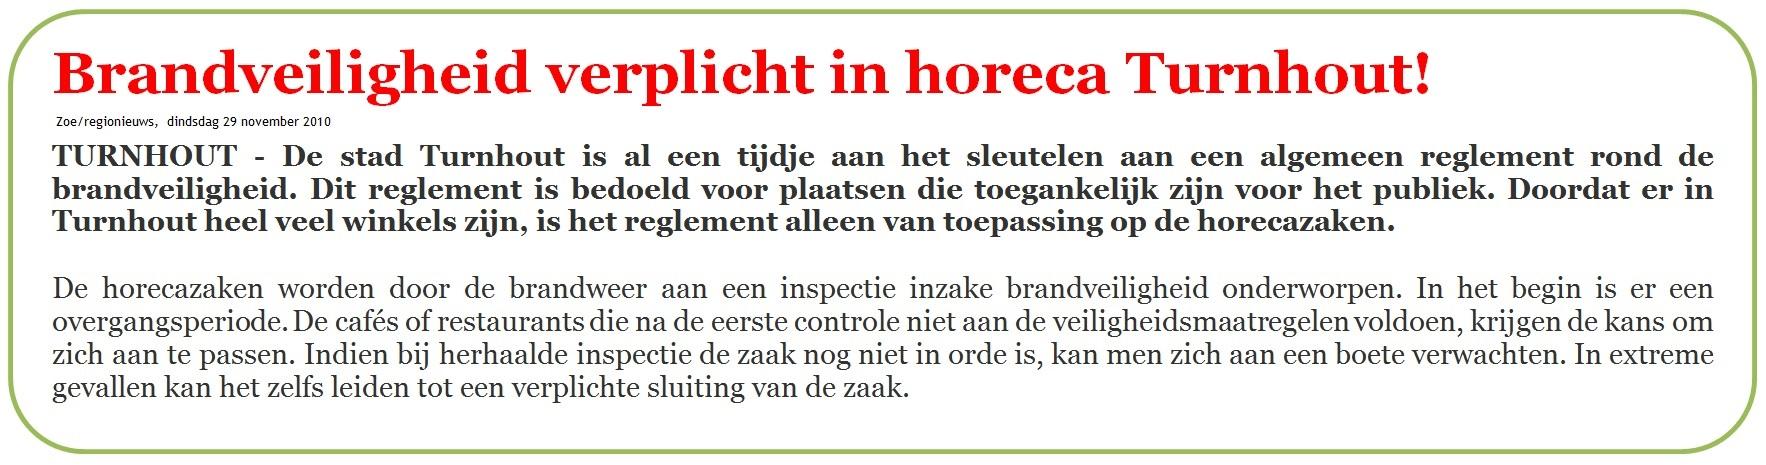 Brandveiligheid verplicht in horeca Turnhout